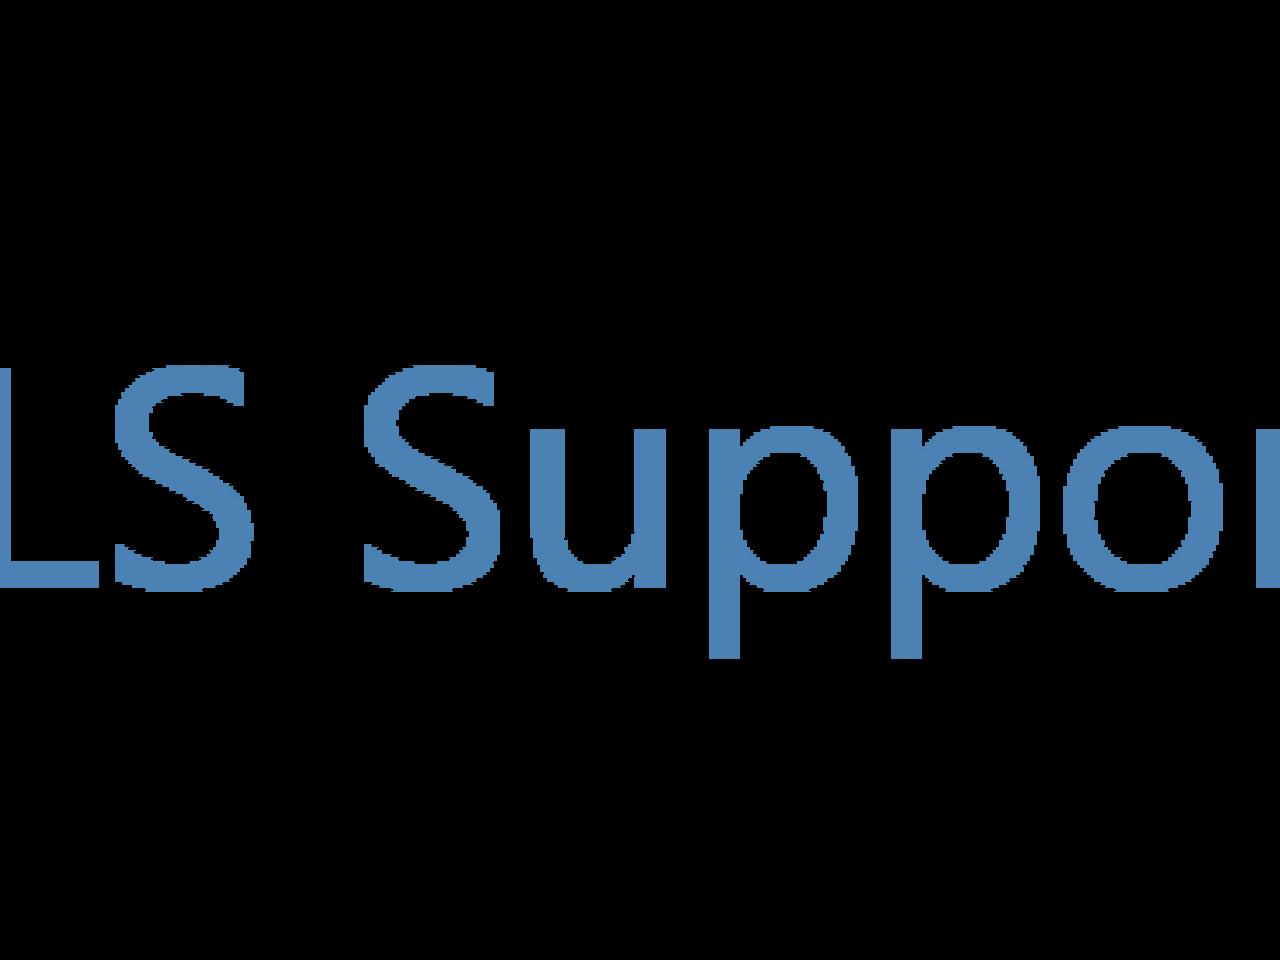 ALS Support Ecosystem